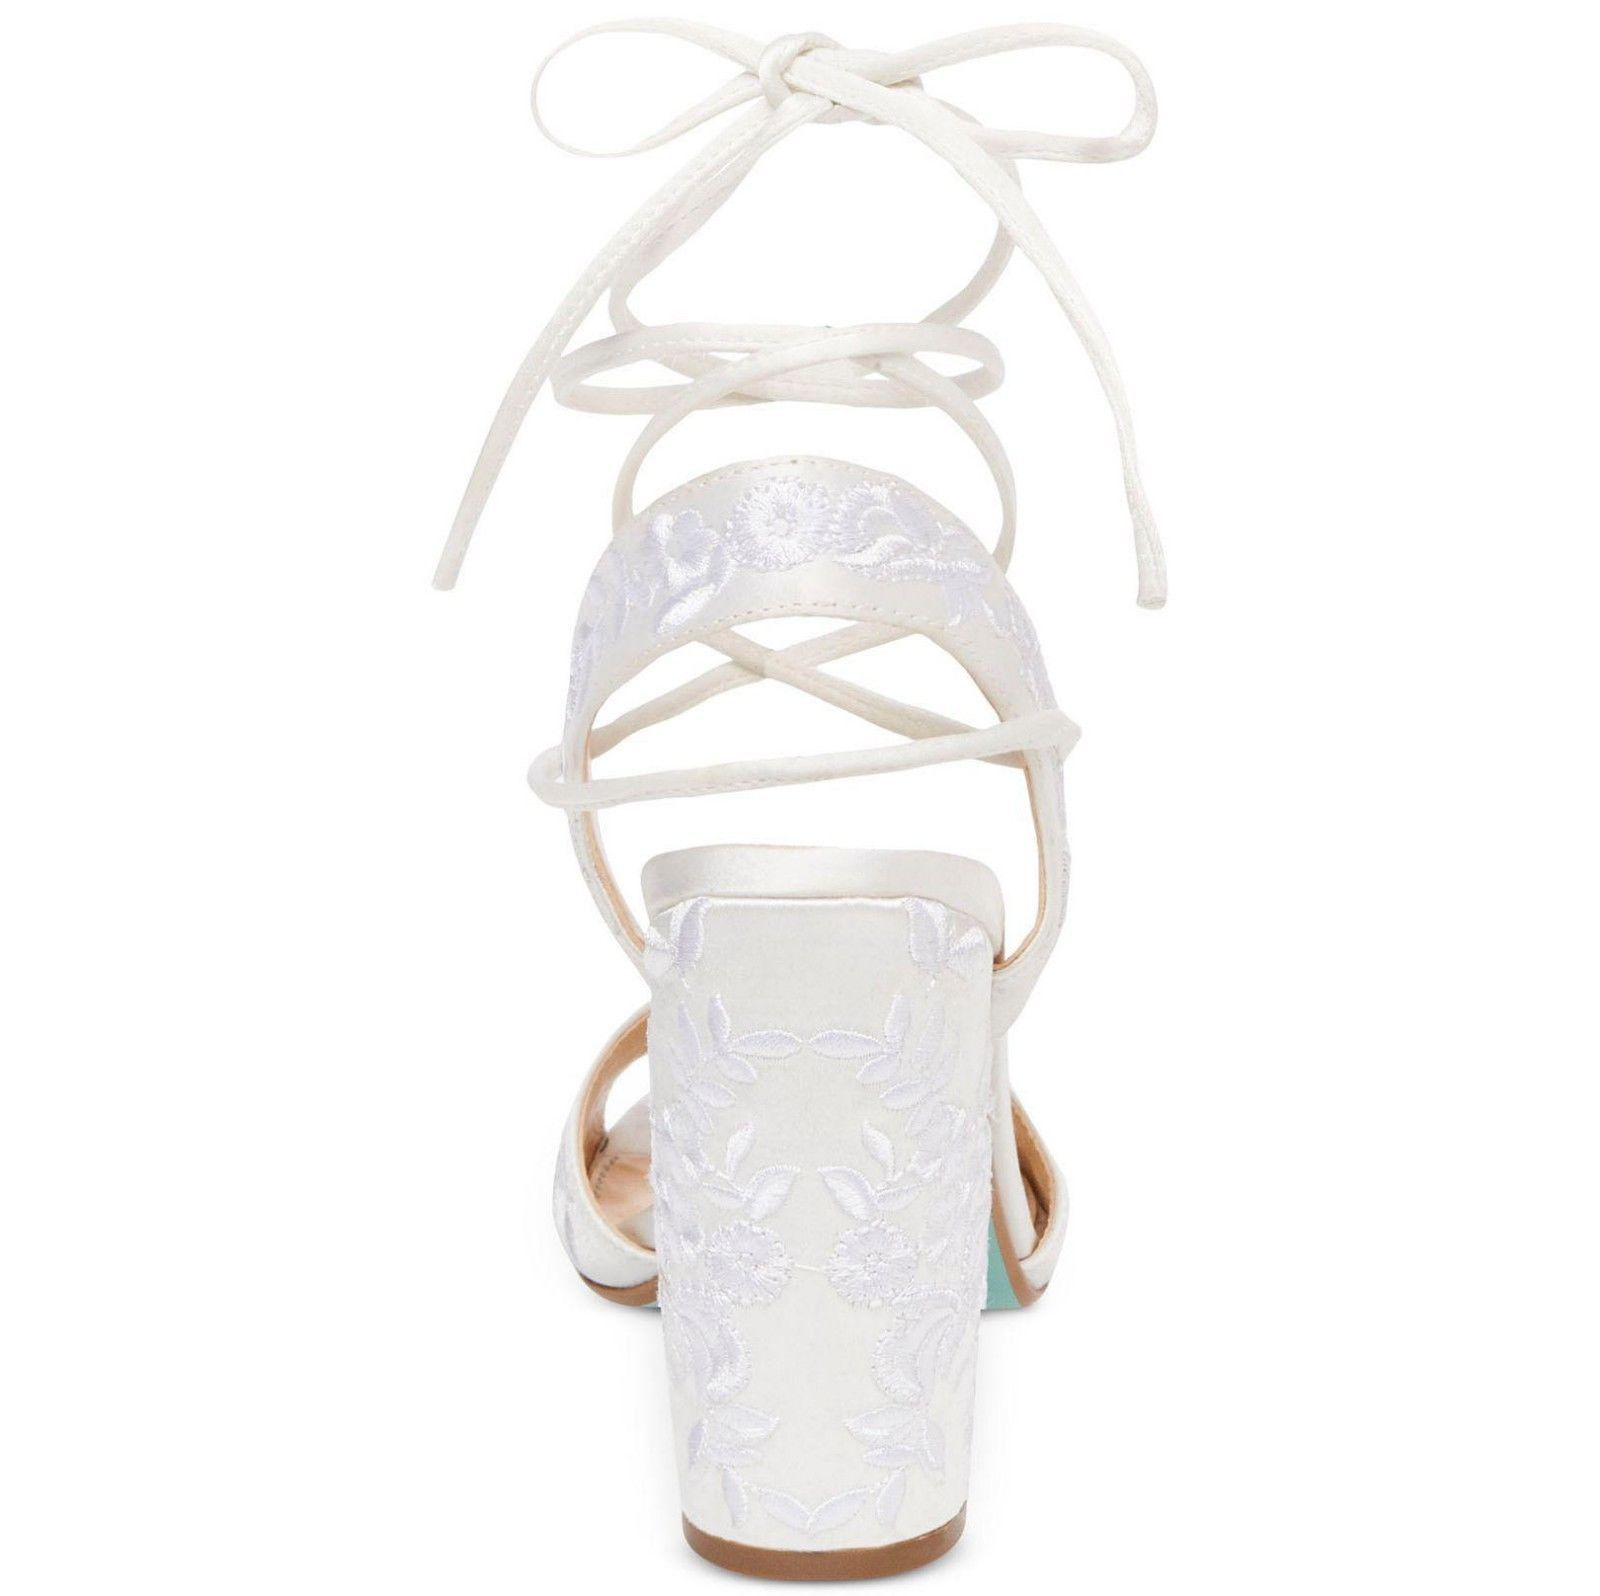 Betsey Johnson Raine Ivory Satin Embroidered Lace Up Wedding Heel Pumps 9.5 NIB